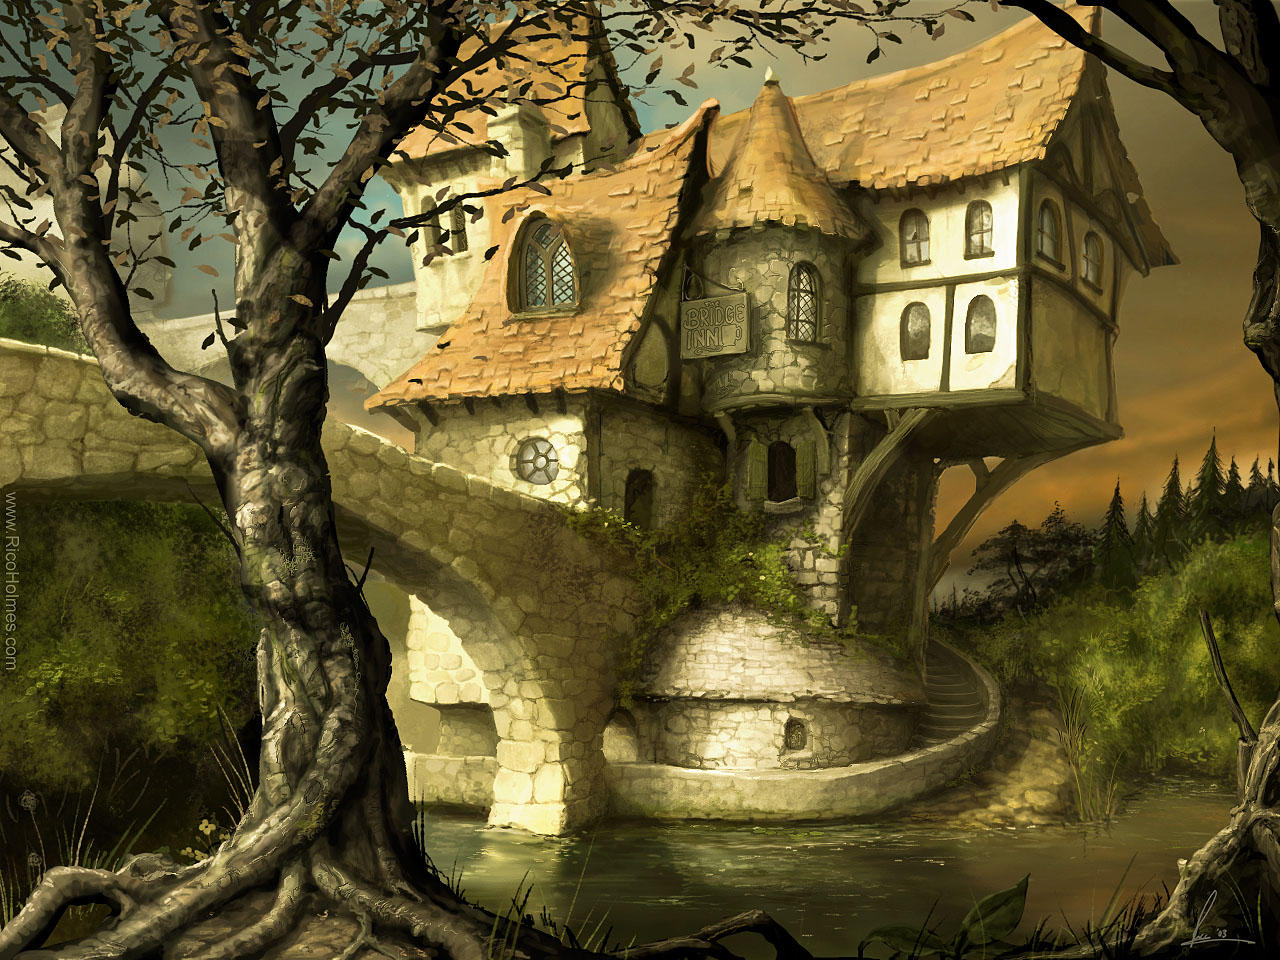 The Bridge Inn by reeks